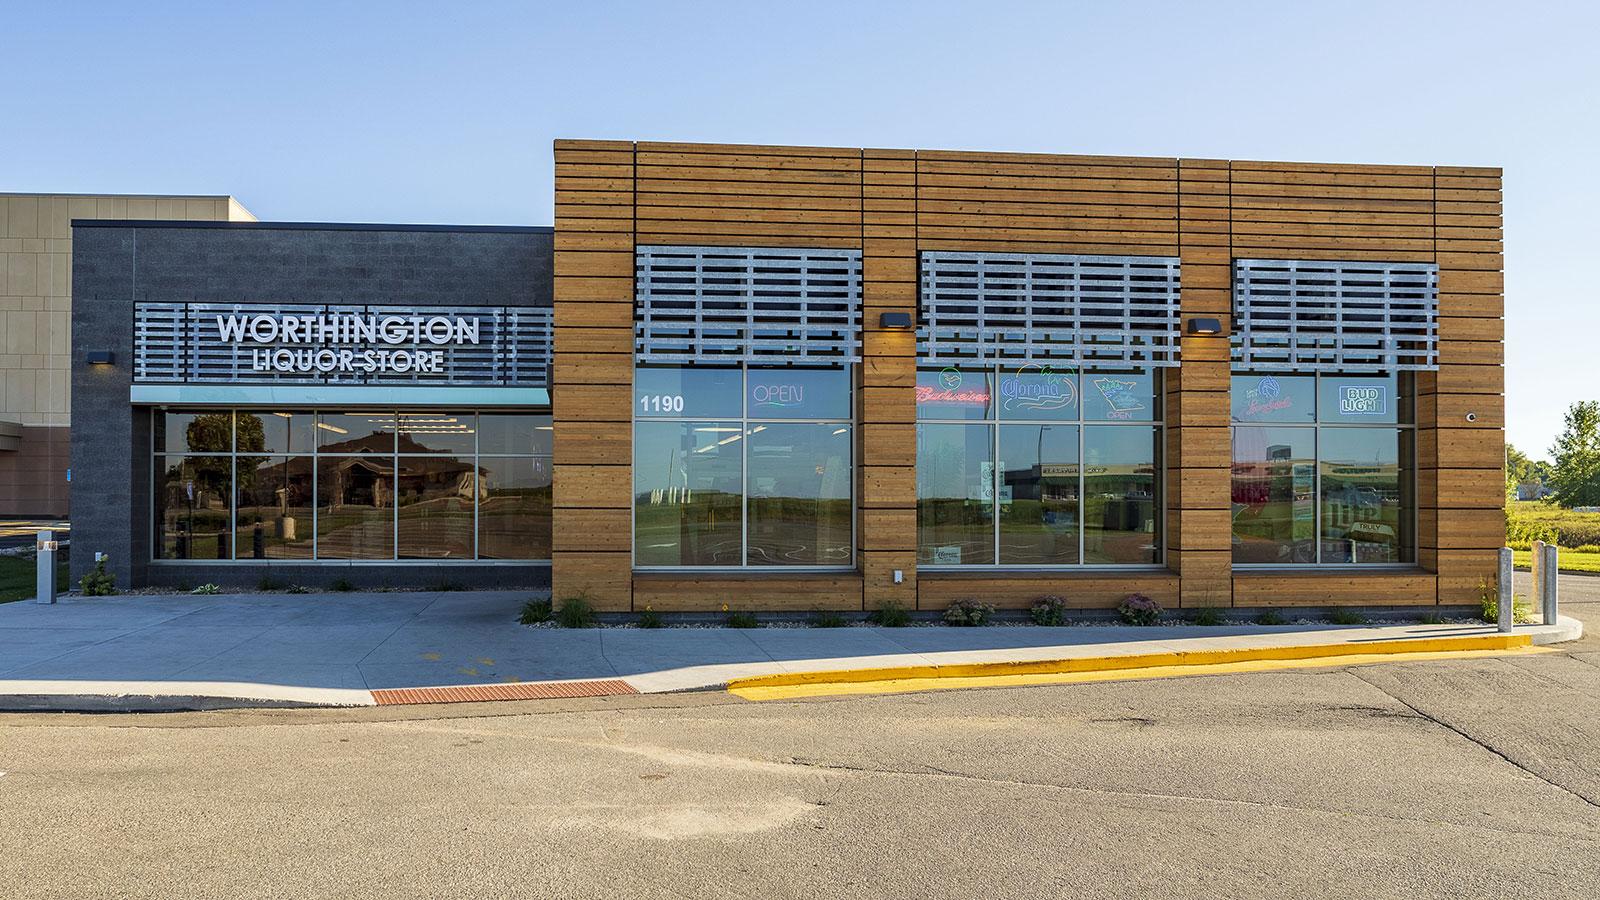 Worthington Liquor Store